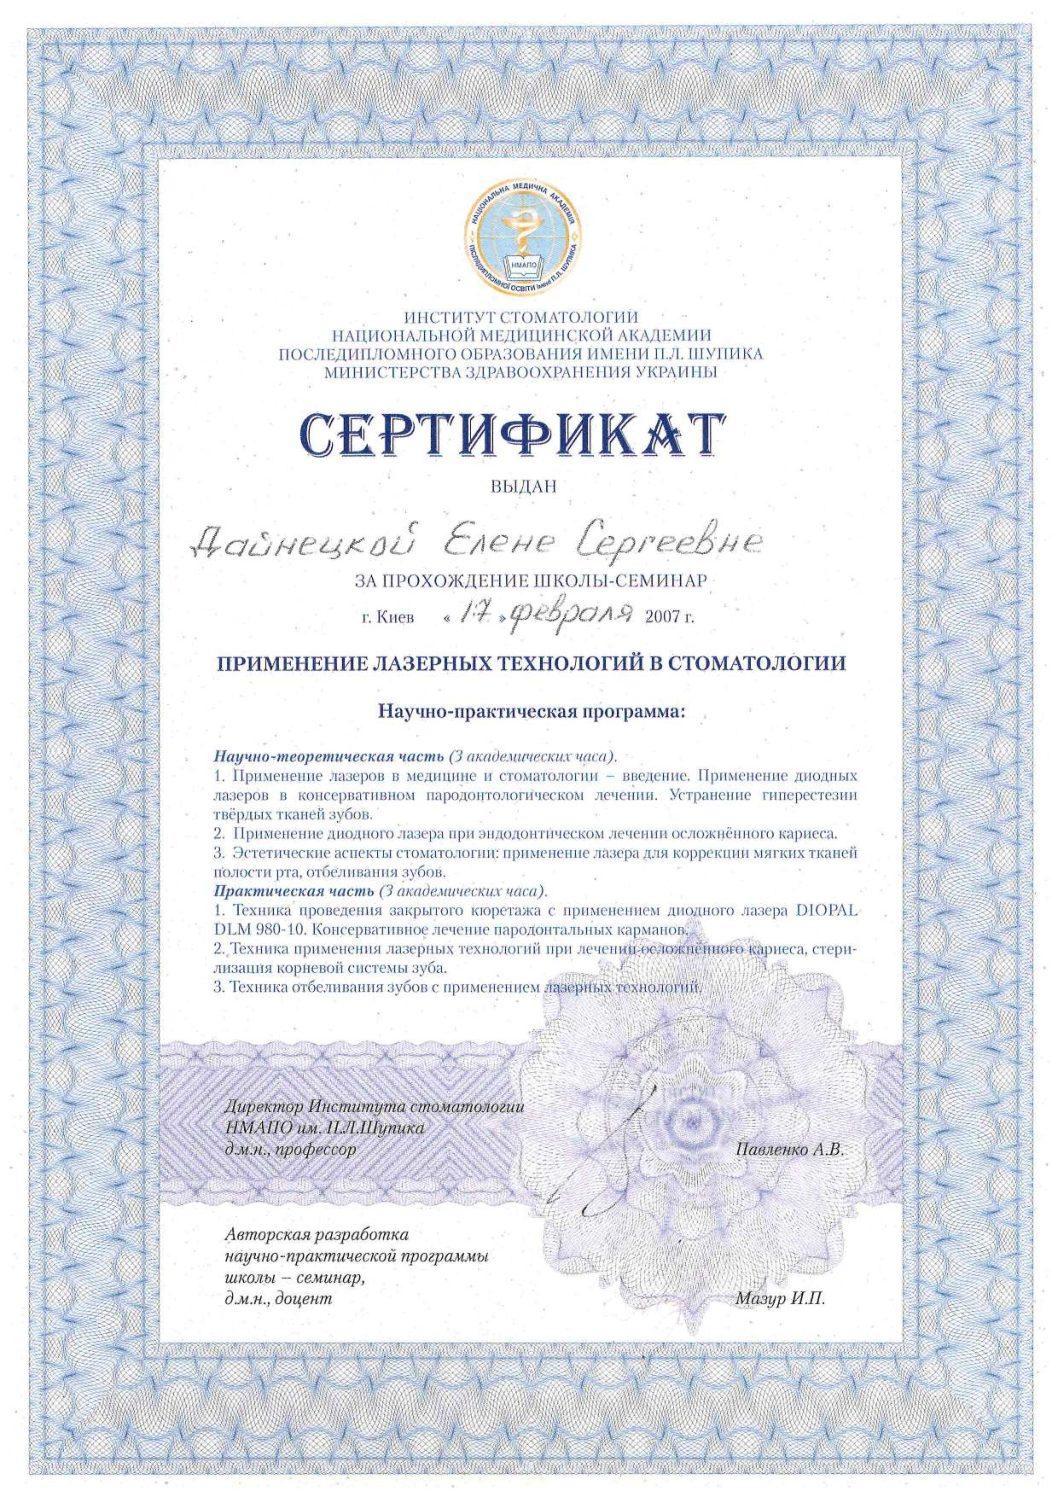 Untitled.FR29.tif compressed pdf - Олена Дайнецька